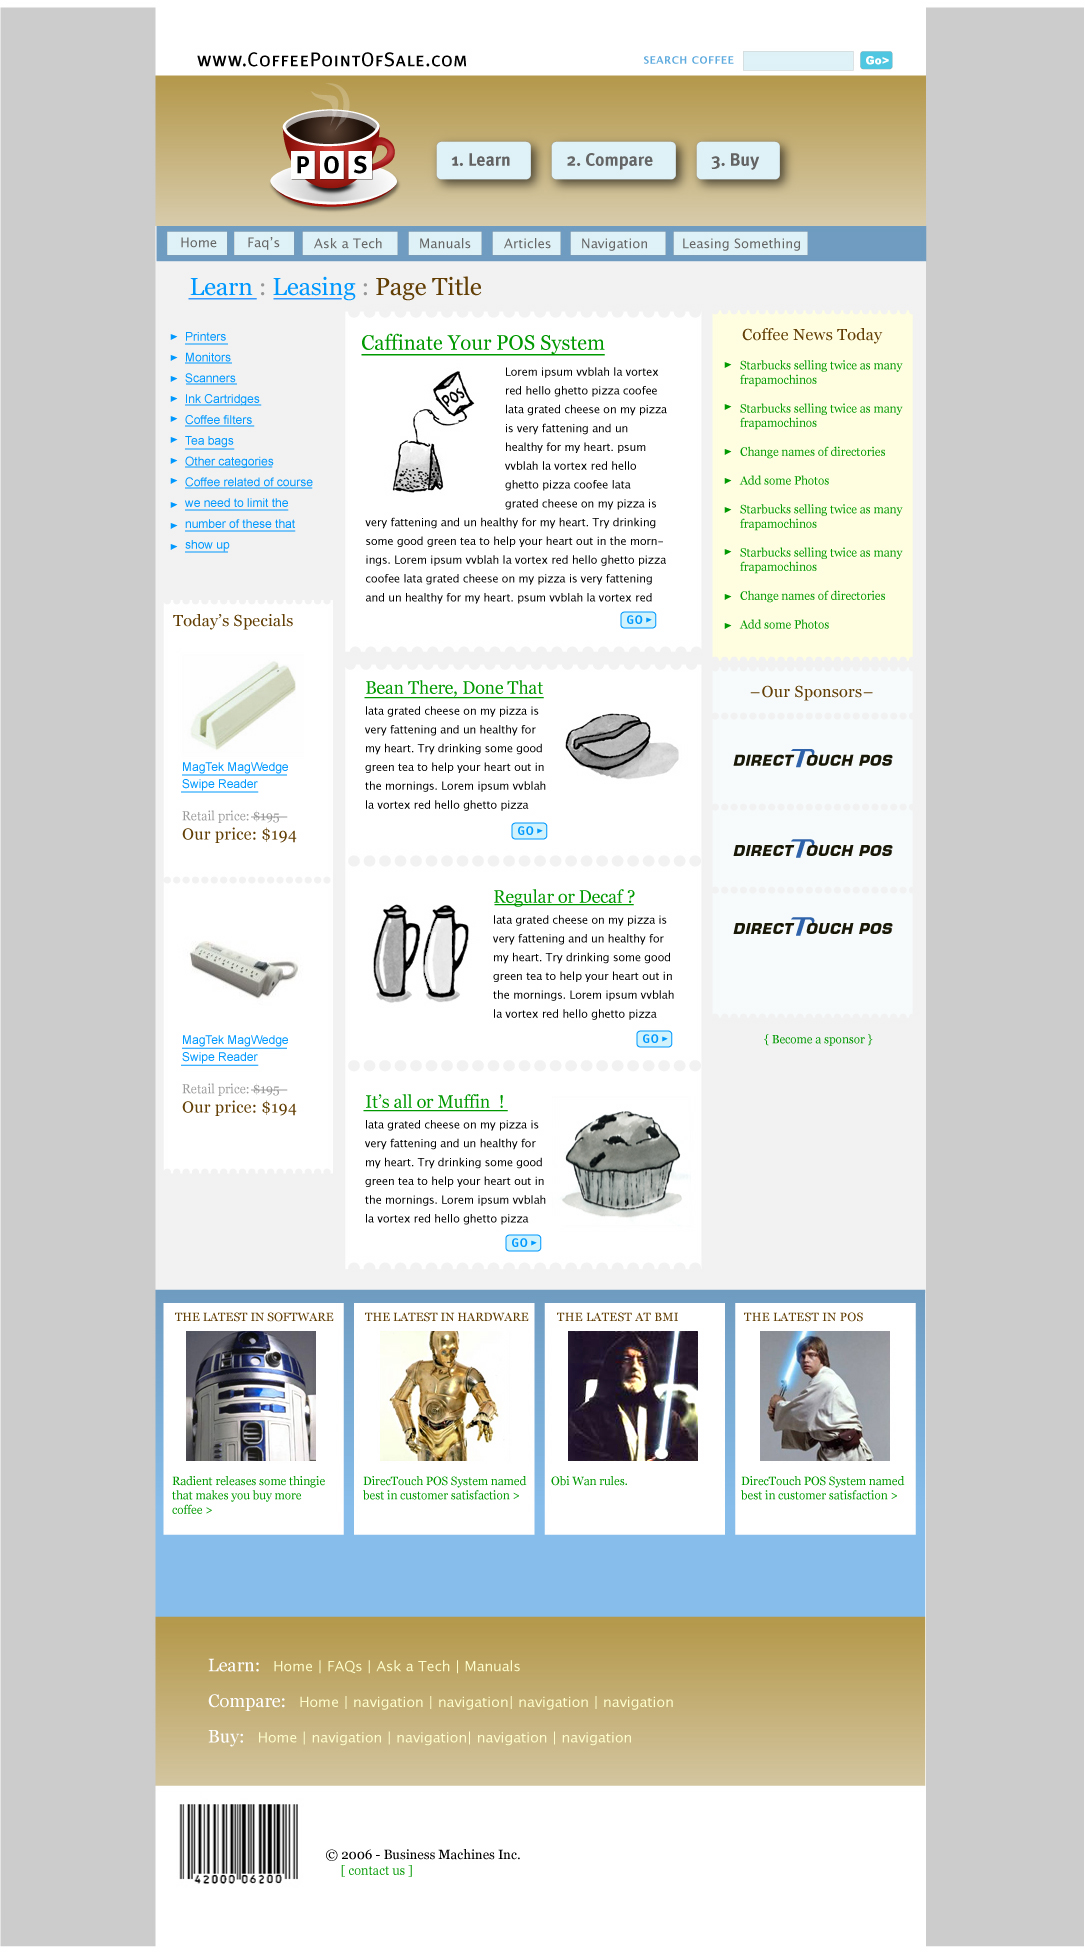 coffee point of sale website design